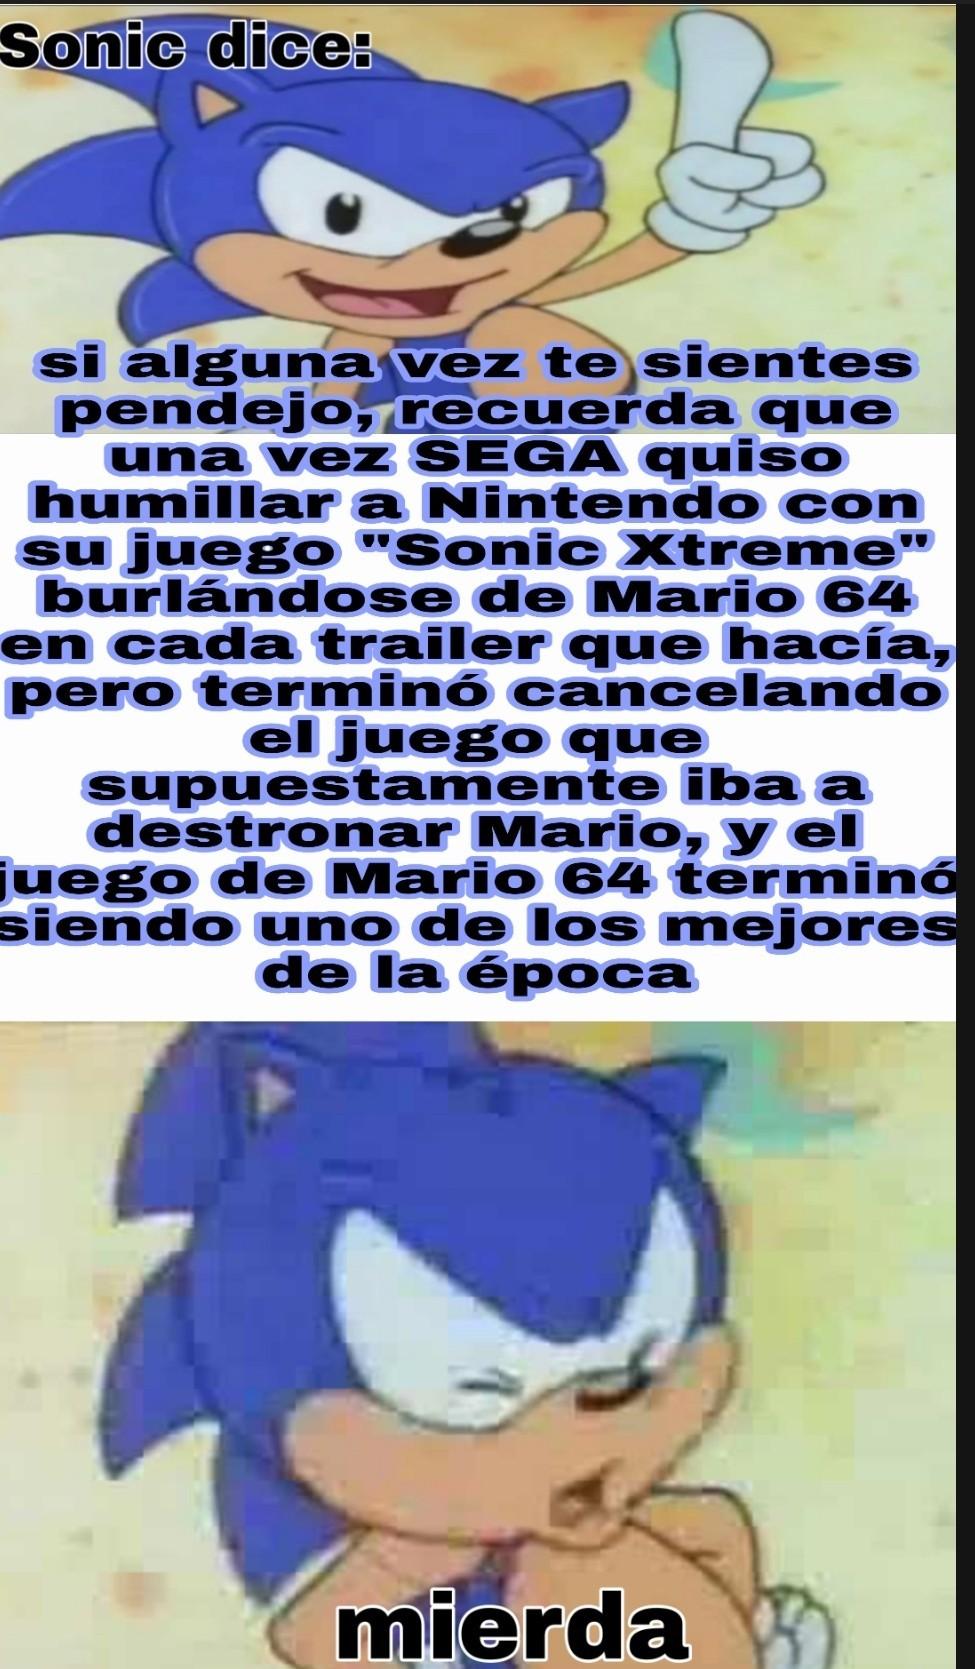 Sonic se hizo daño así mismo - meme